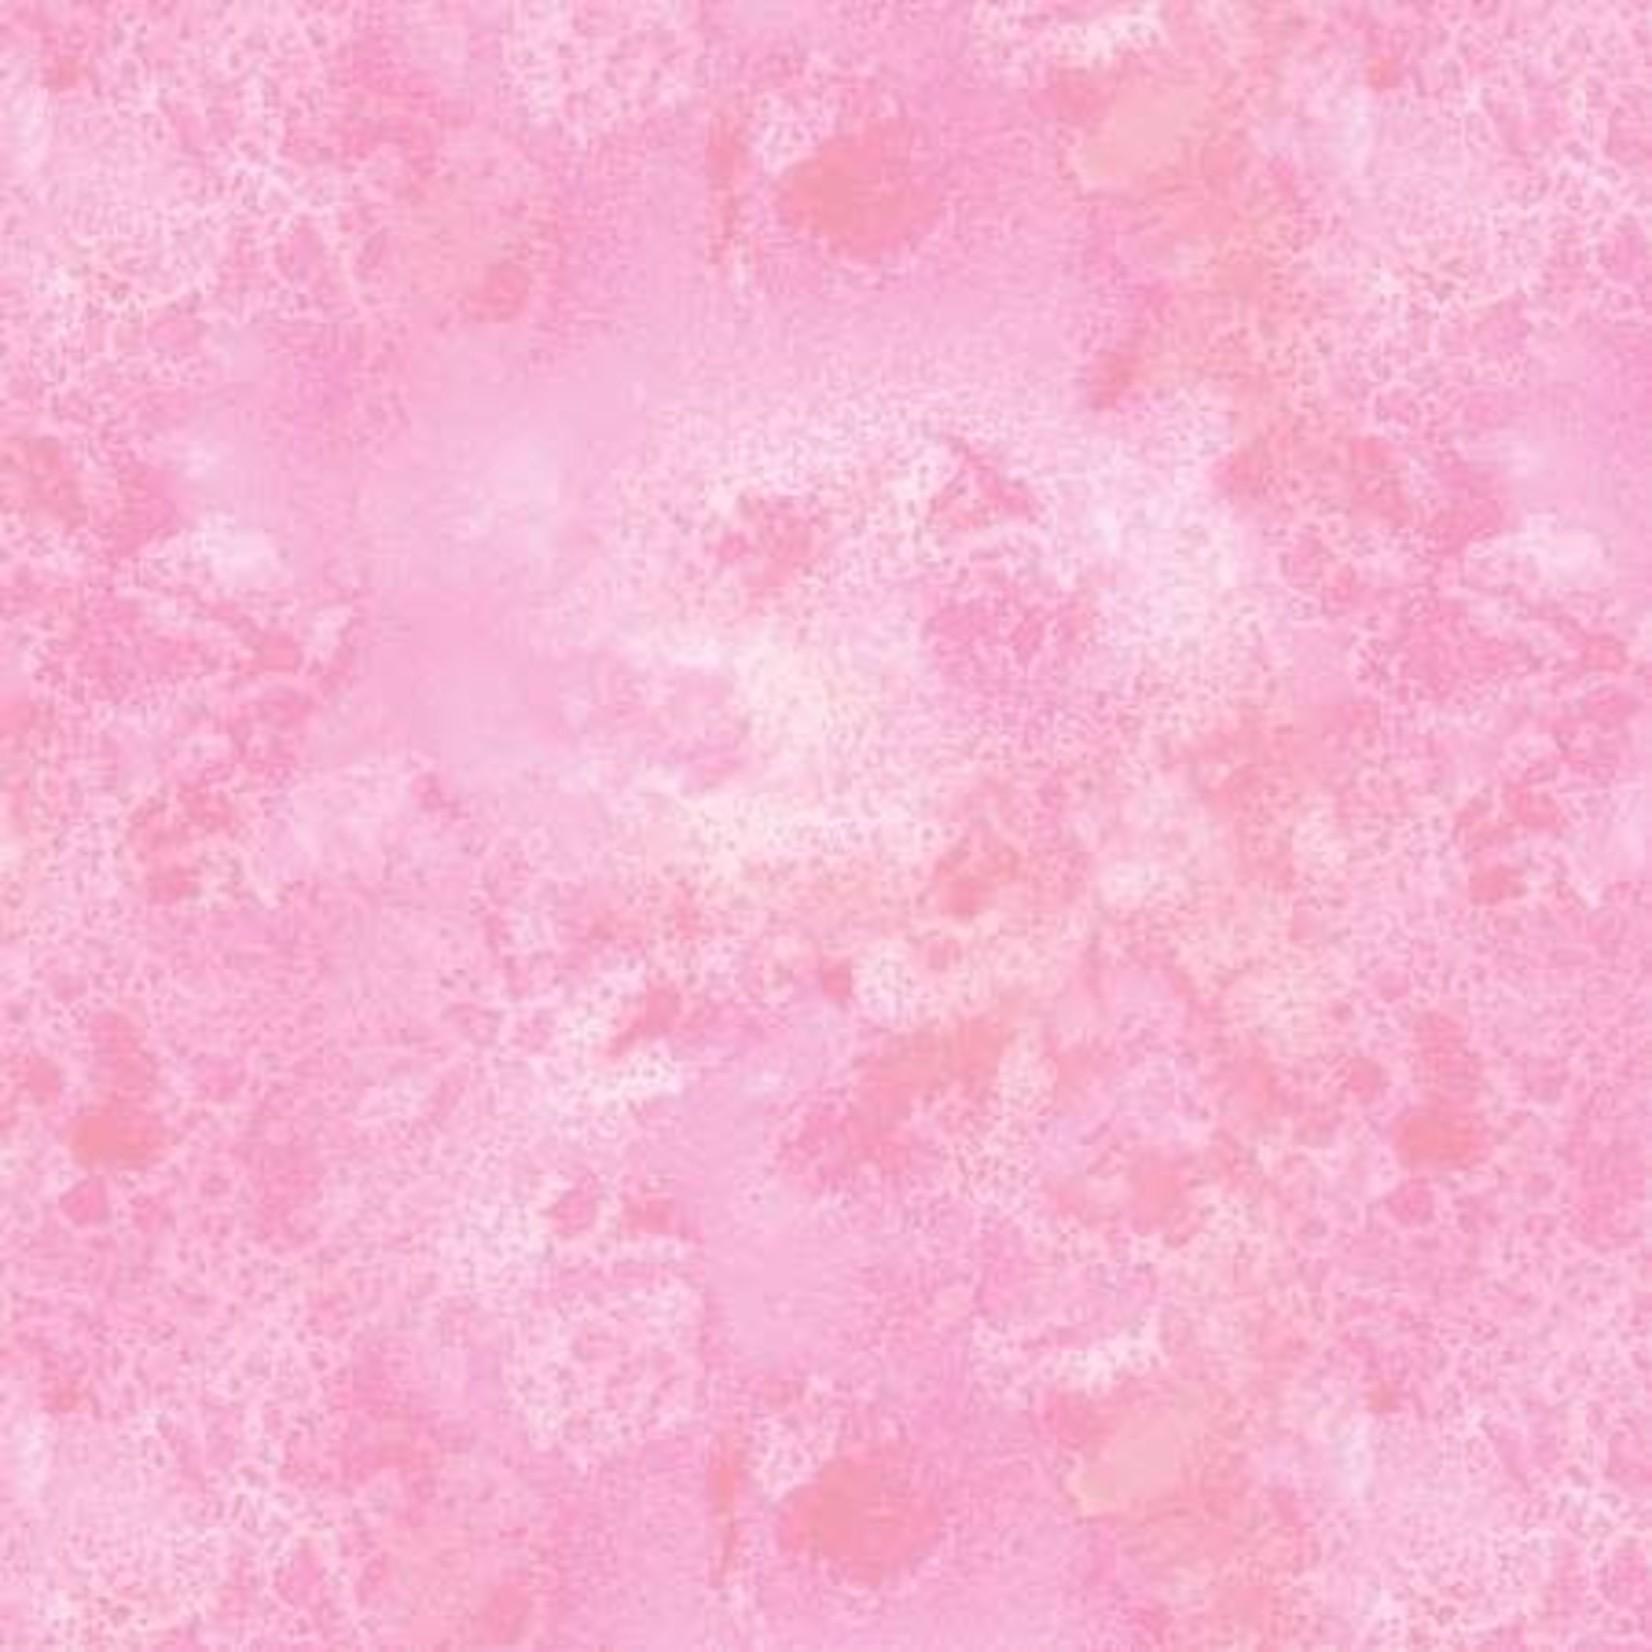 Wilmington Prints Cosmos - Pink